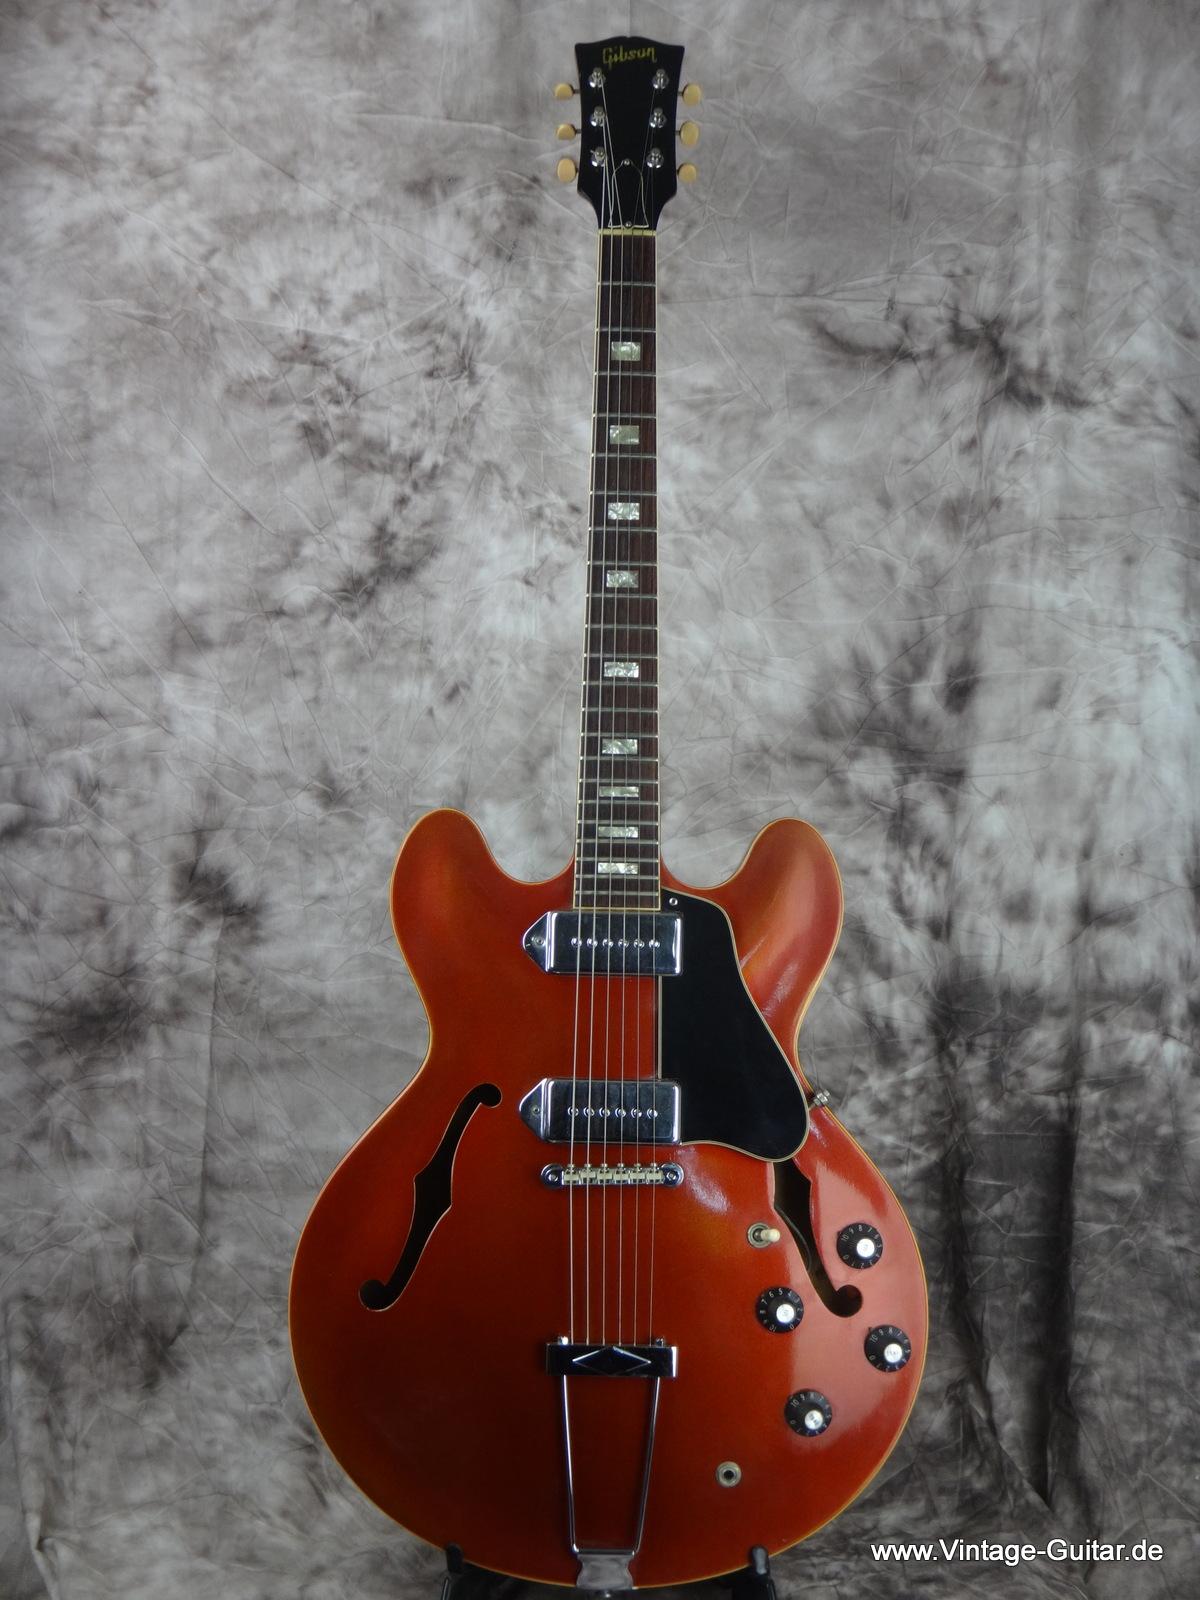 Gibson-ES-330-burgundy-metallic-1968.JPG